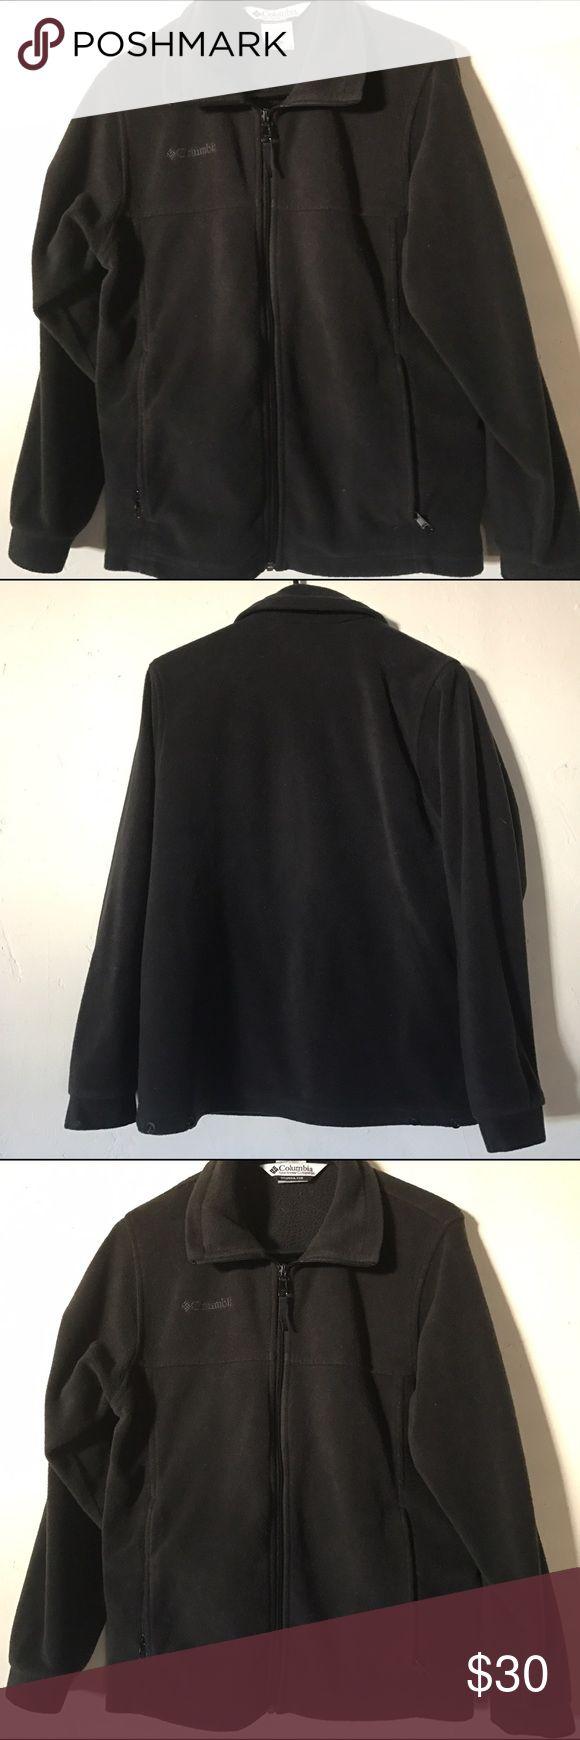 Columbia coat very warm 14/16 youth fits medium Great condition like new Columbia Jackets & Coats